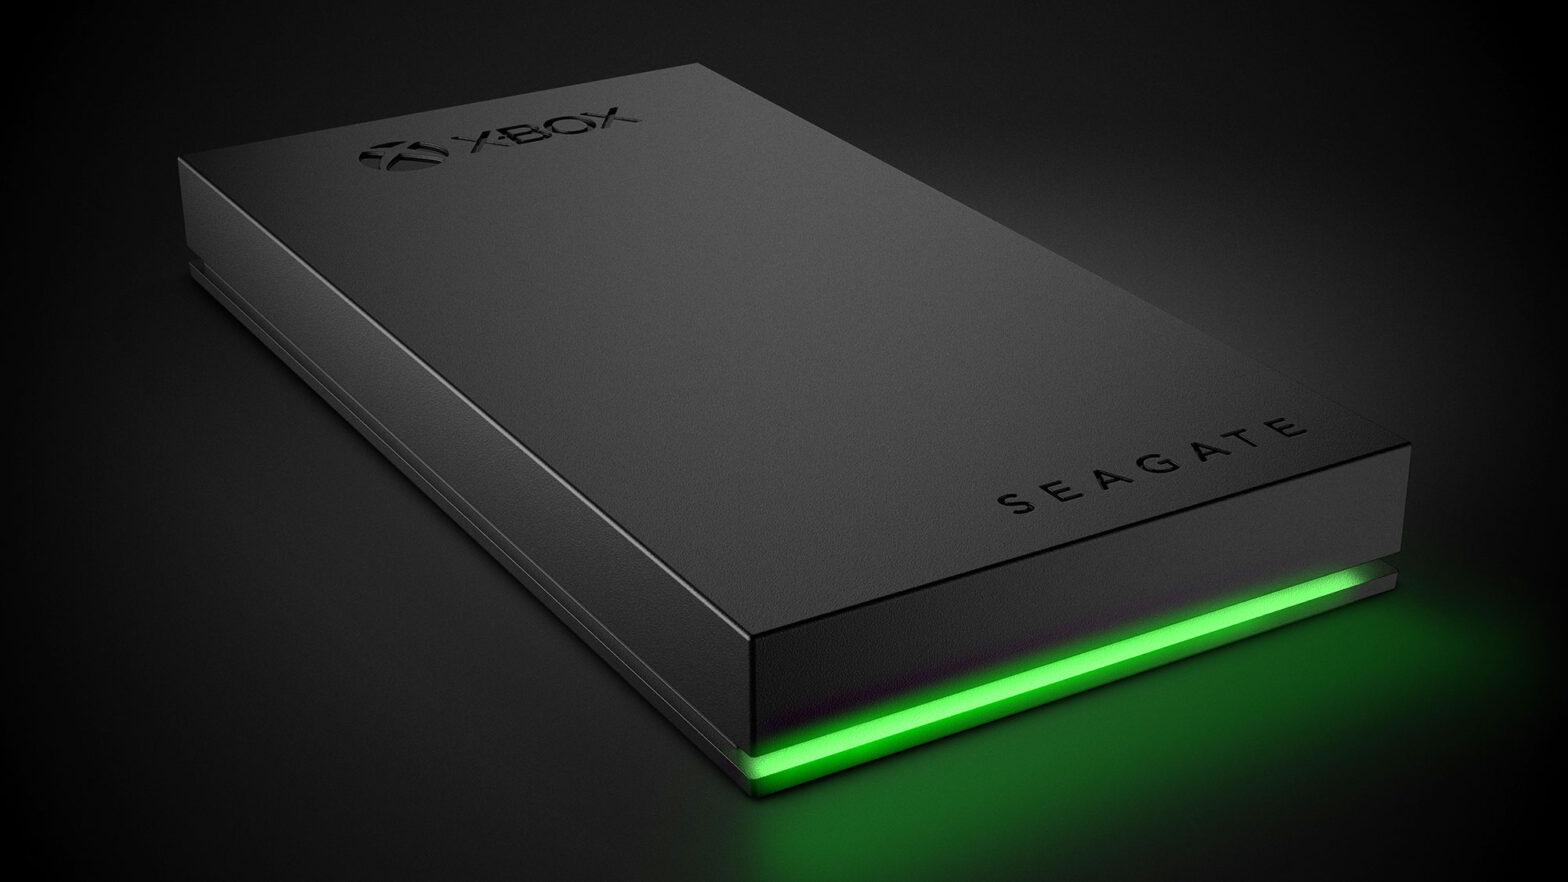 Seagate 1 TB Xbox Game Drive External USB SSD